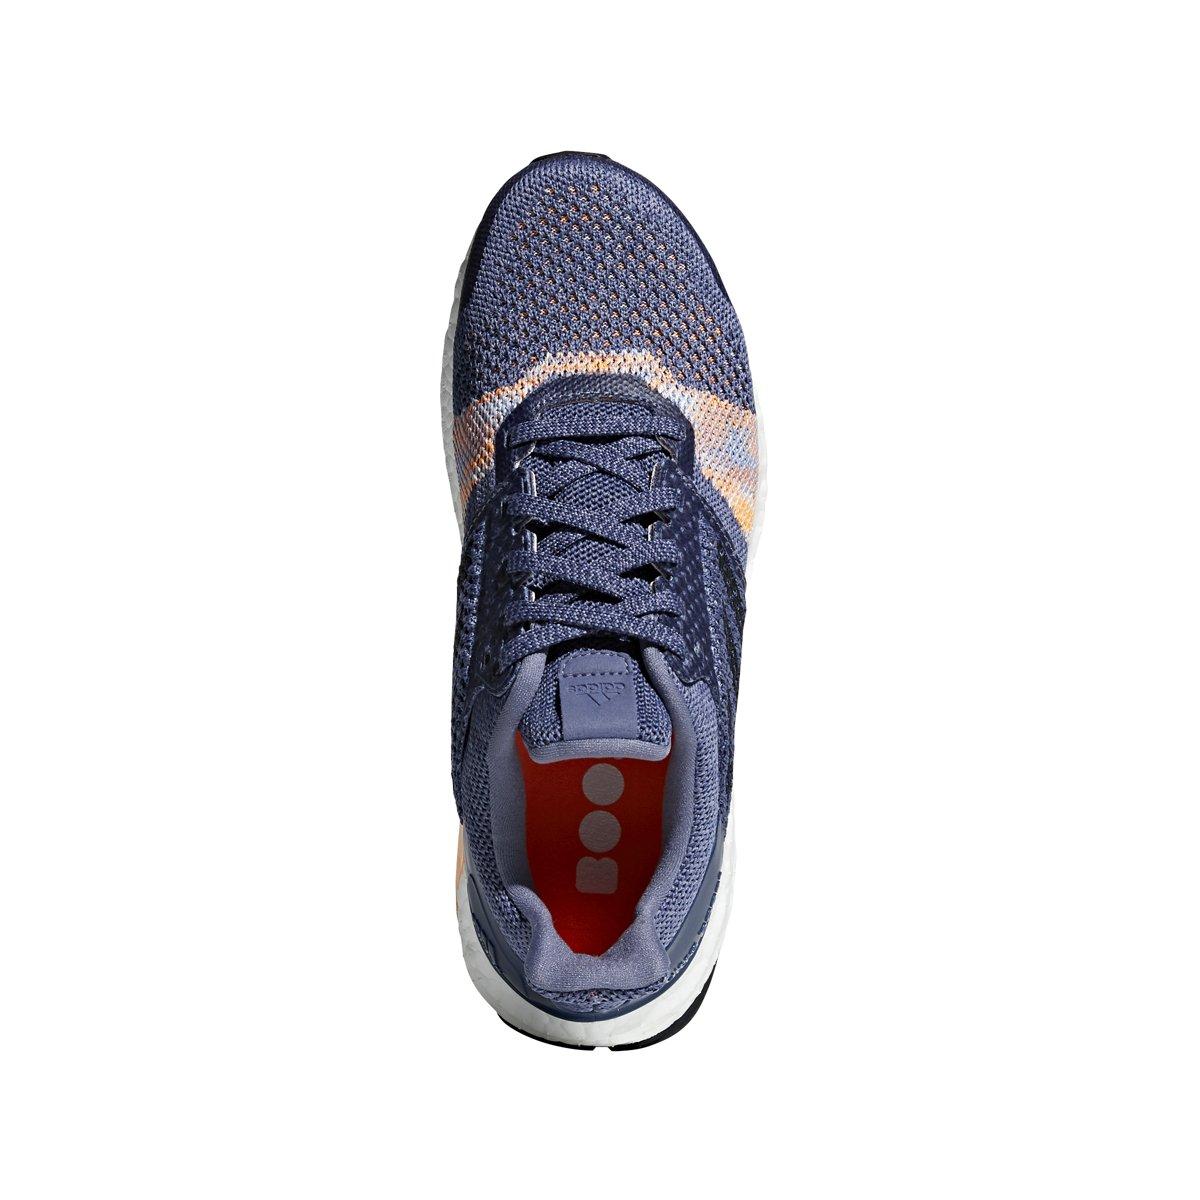 adidas Performance Women's Ultra Boost Street Running Shoe by adidas (Image #2)